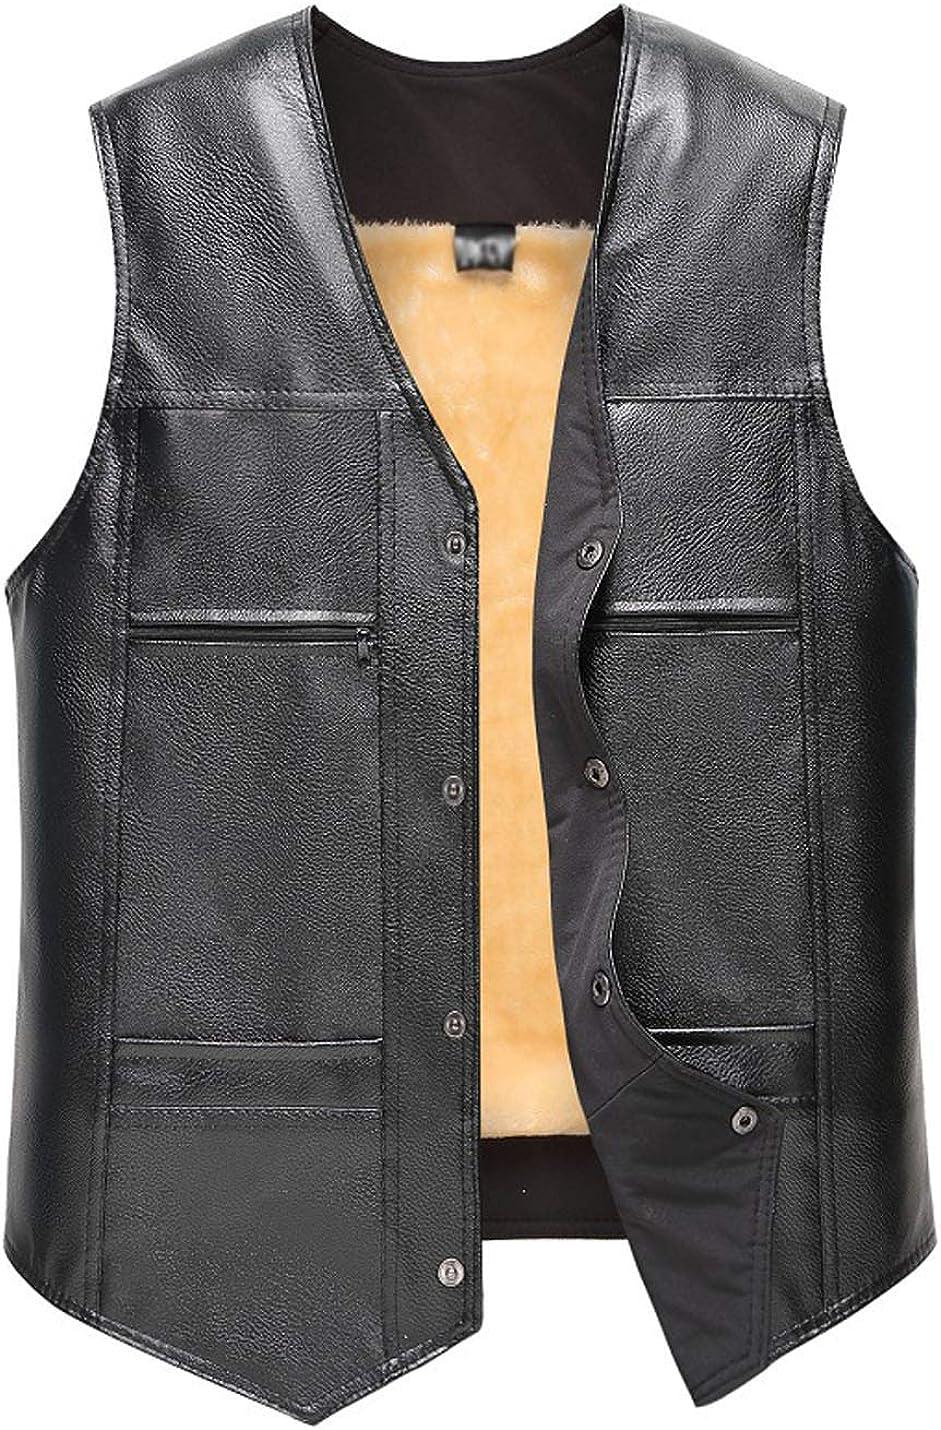 Flygo Men's Classic PU Leather Vest Fleece Sherpa Lined Waistcoat Sleeveless Button Down V Neck Jacket